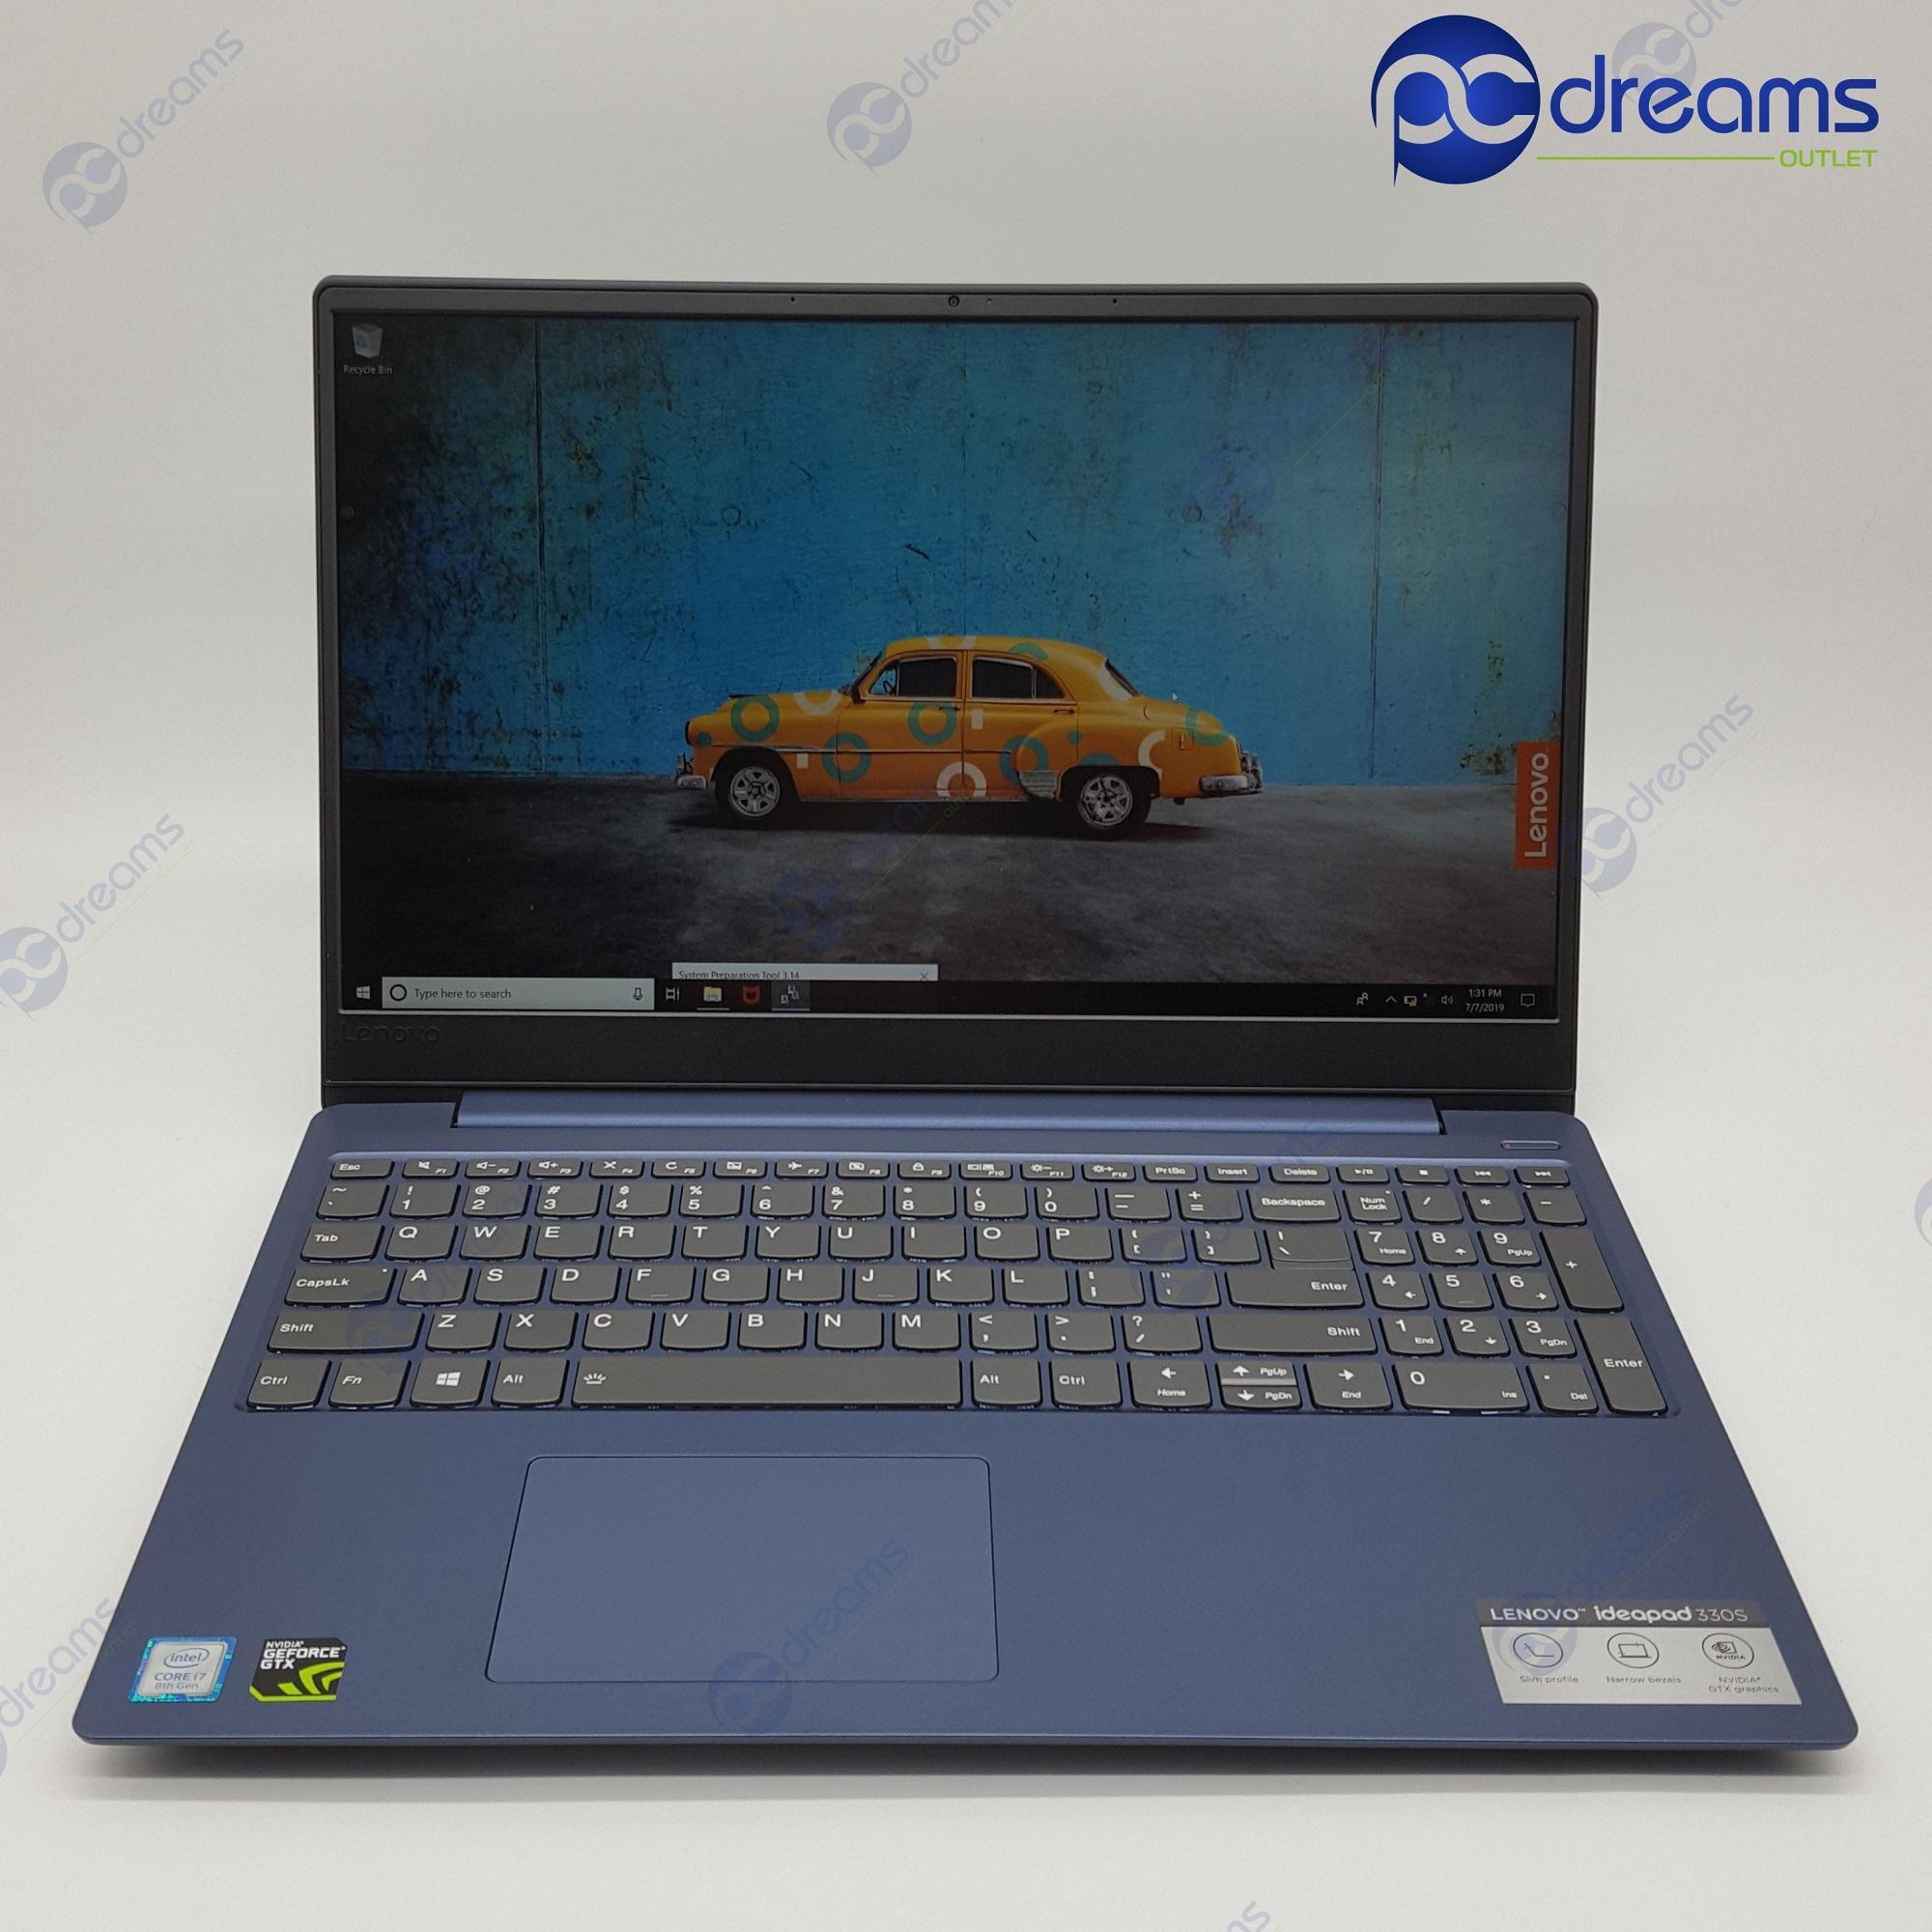 LENOVO IDEAPAD 330S-15IKB (81GC007YSB) i7-8550U/8GB/512GB PCIe SSD/GTX1050 [Premium Refreshed]